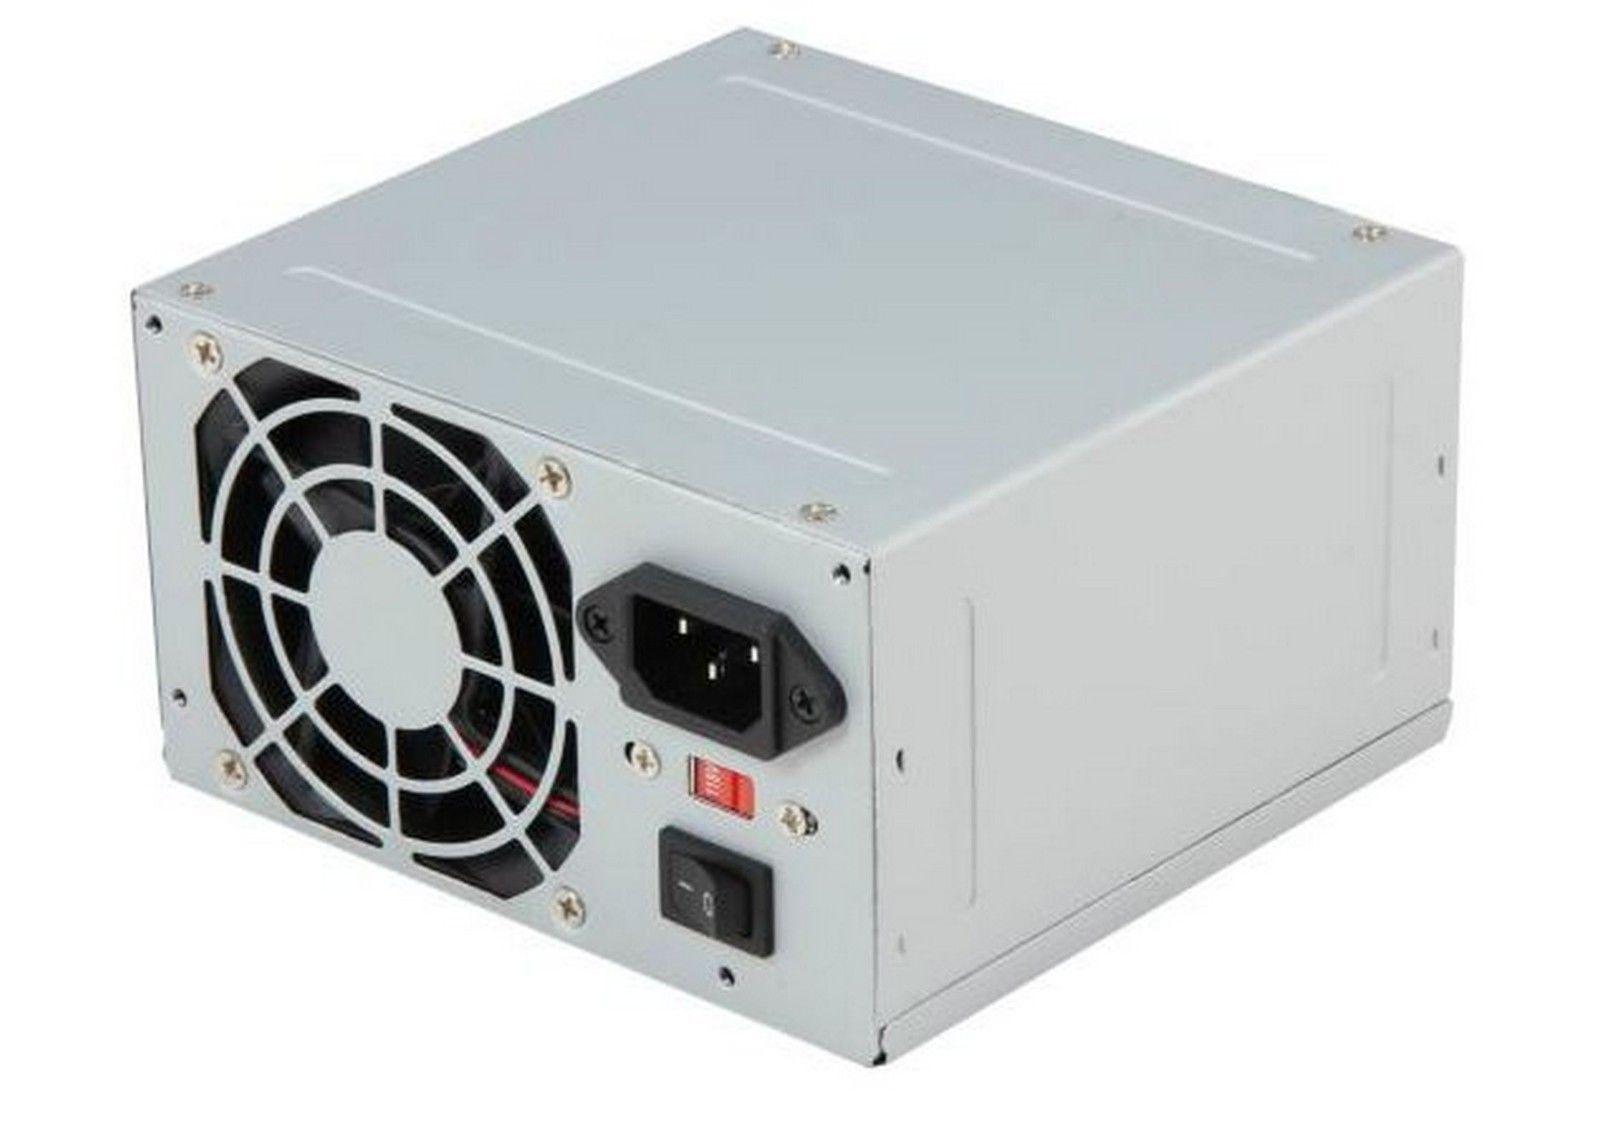 New PC Power Supply Upgrade for AOpen FSP160-60SAV Slimline SFF Computer - $39.56